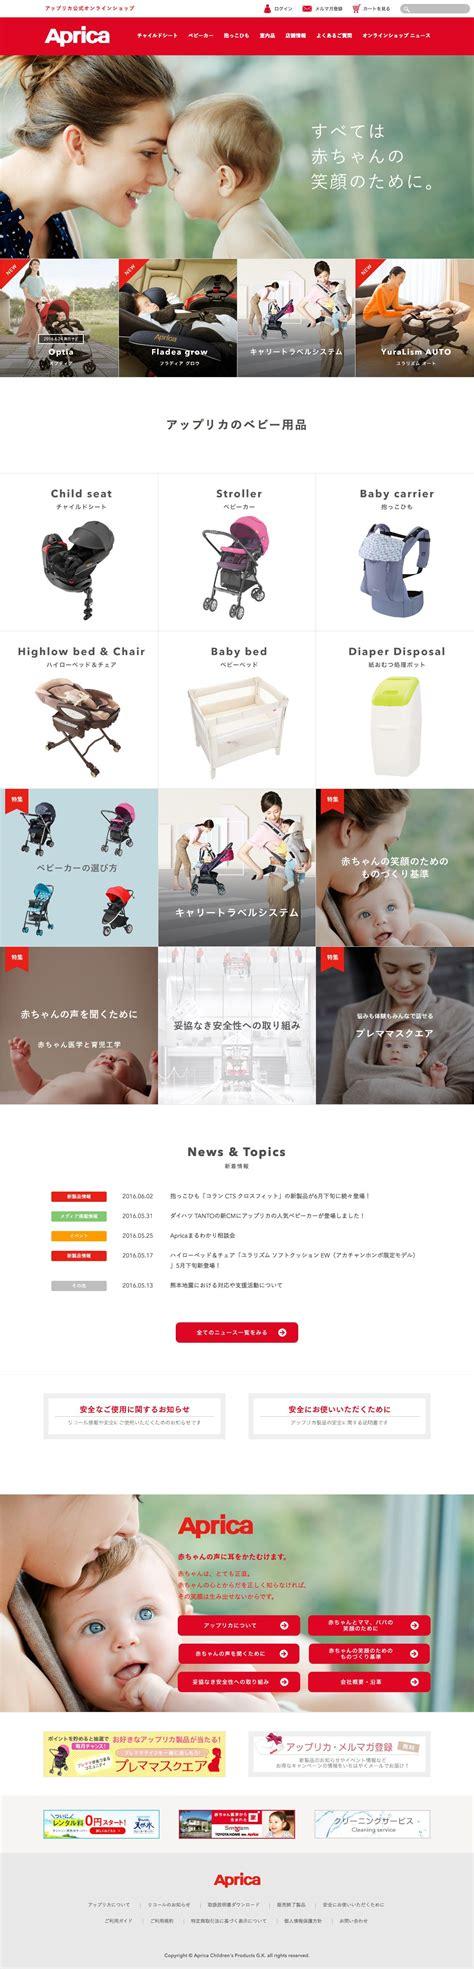 aprica web aprica artnoc webデザインギャラリーサイト